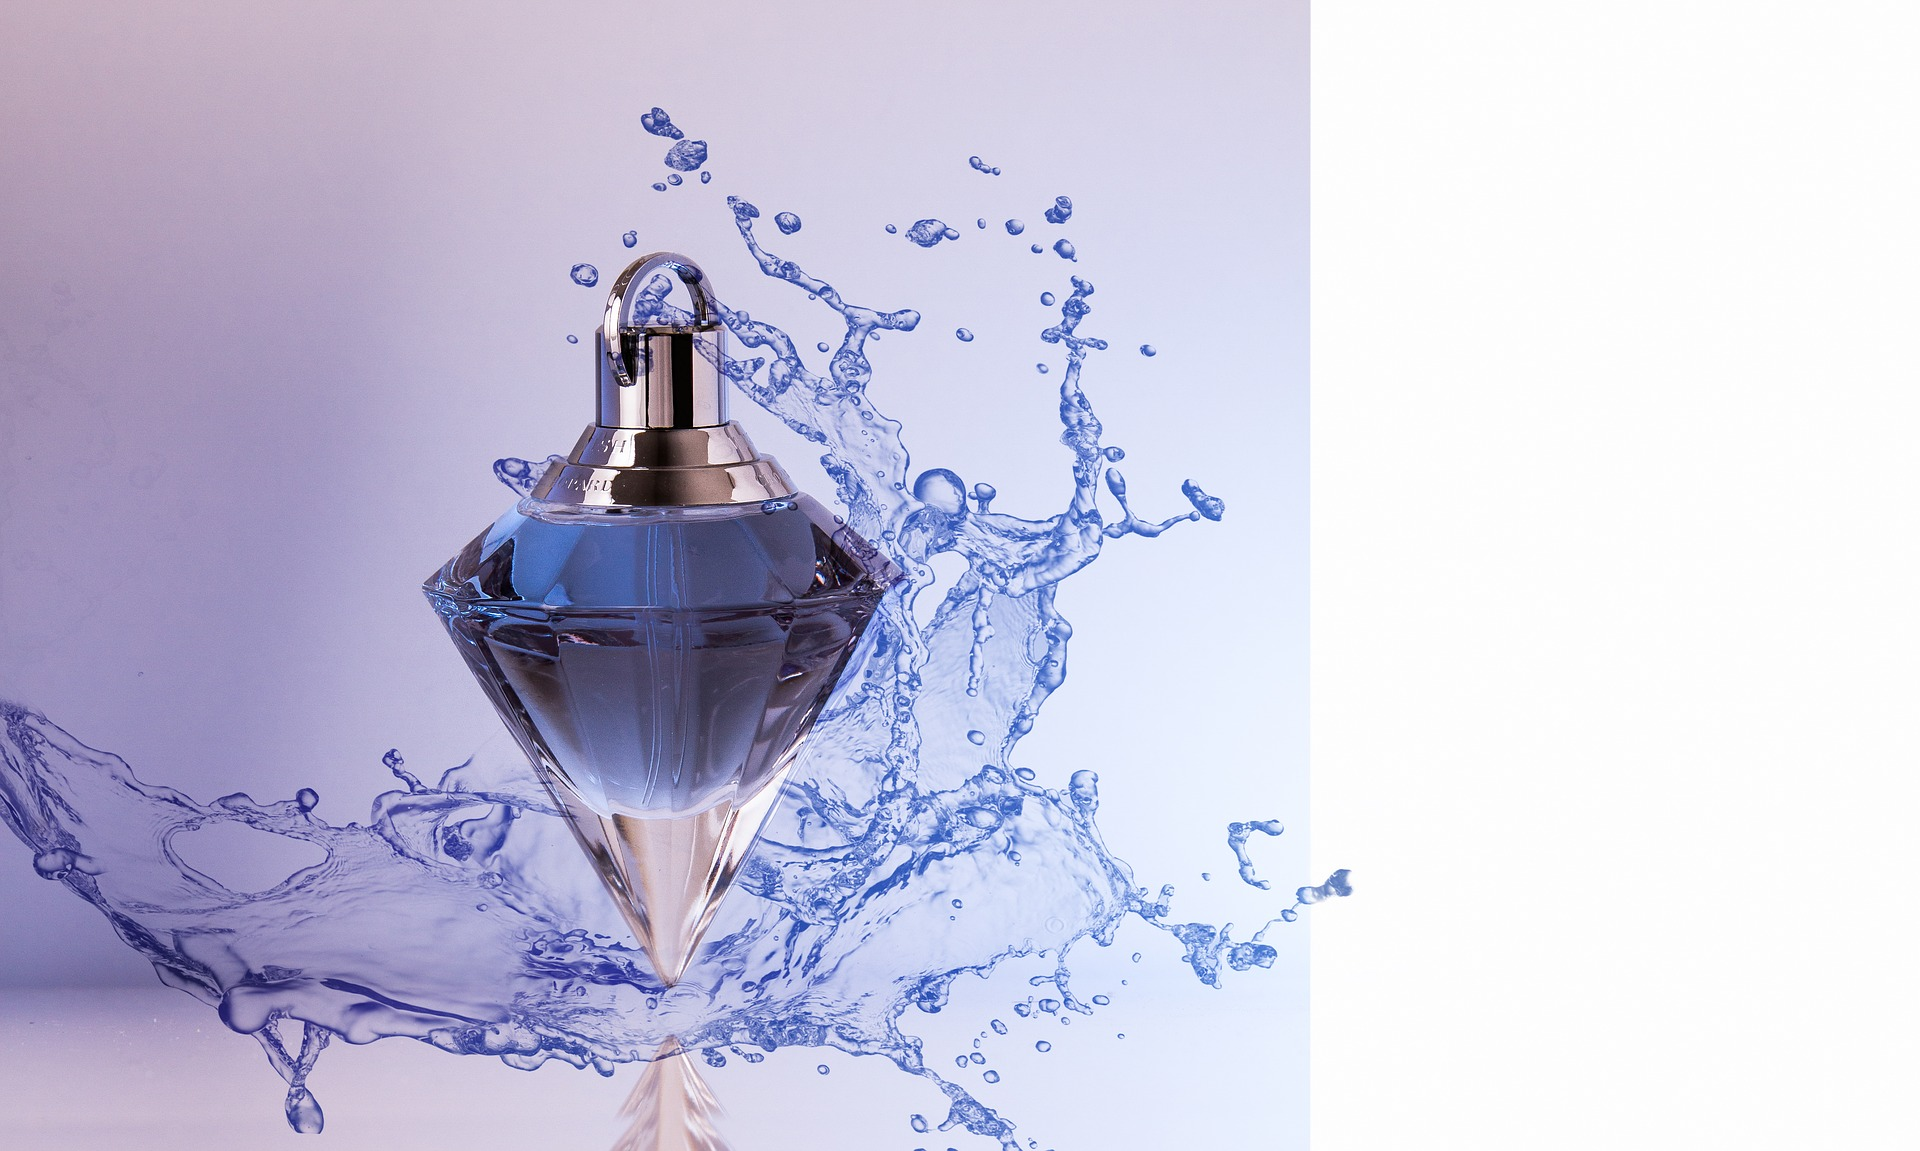 perfume-3275960_1920.jpg